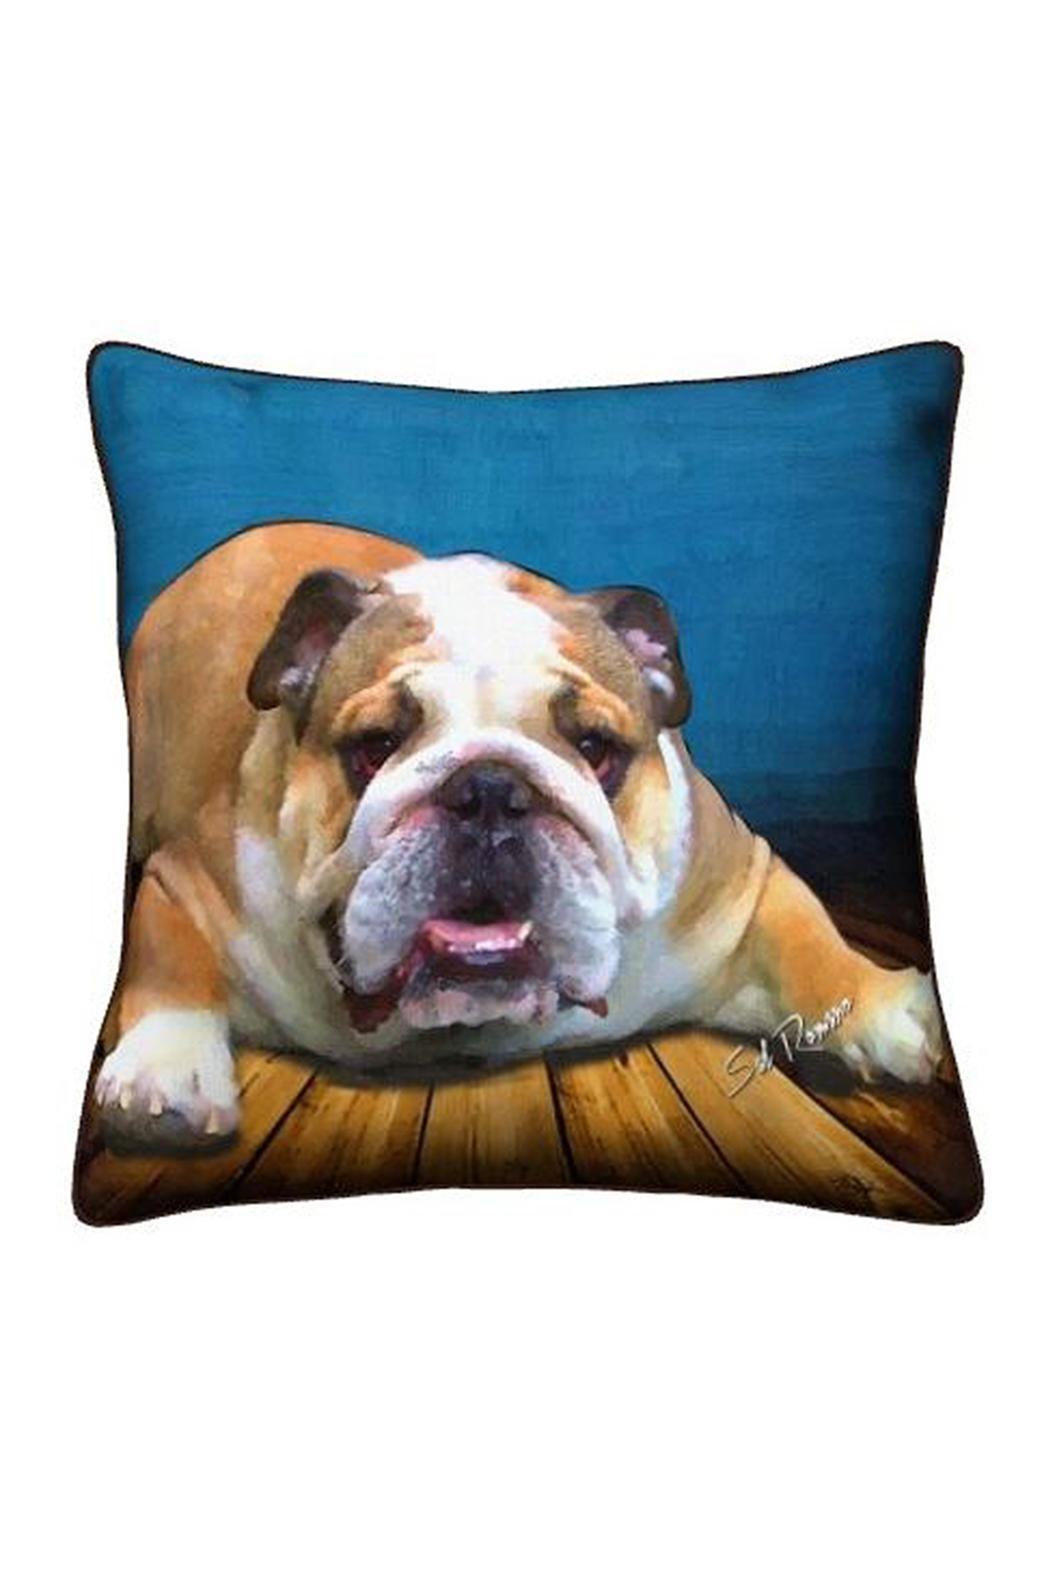 Patricia S Presents Bulldog Pillow Bulldog Puppies Dog Breeds Bulldog